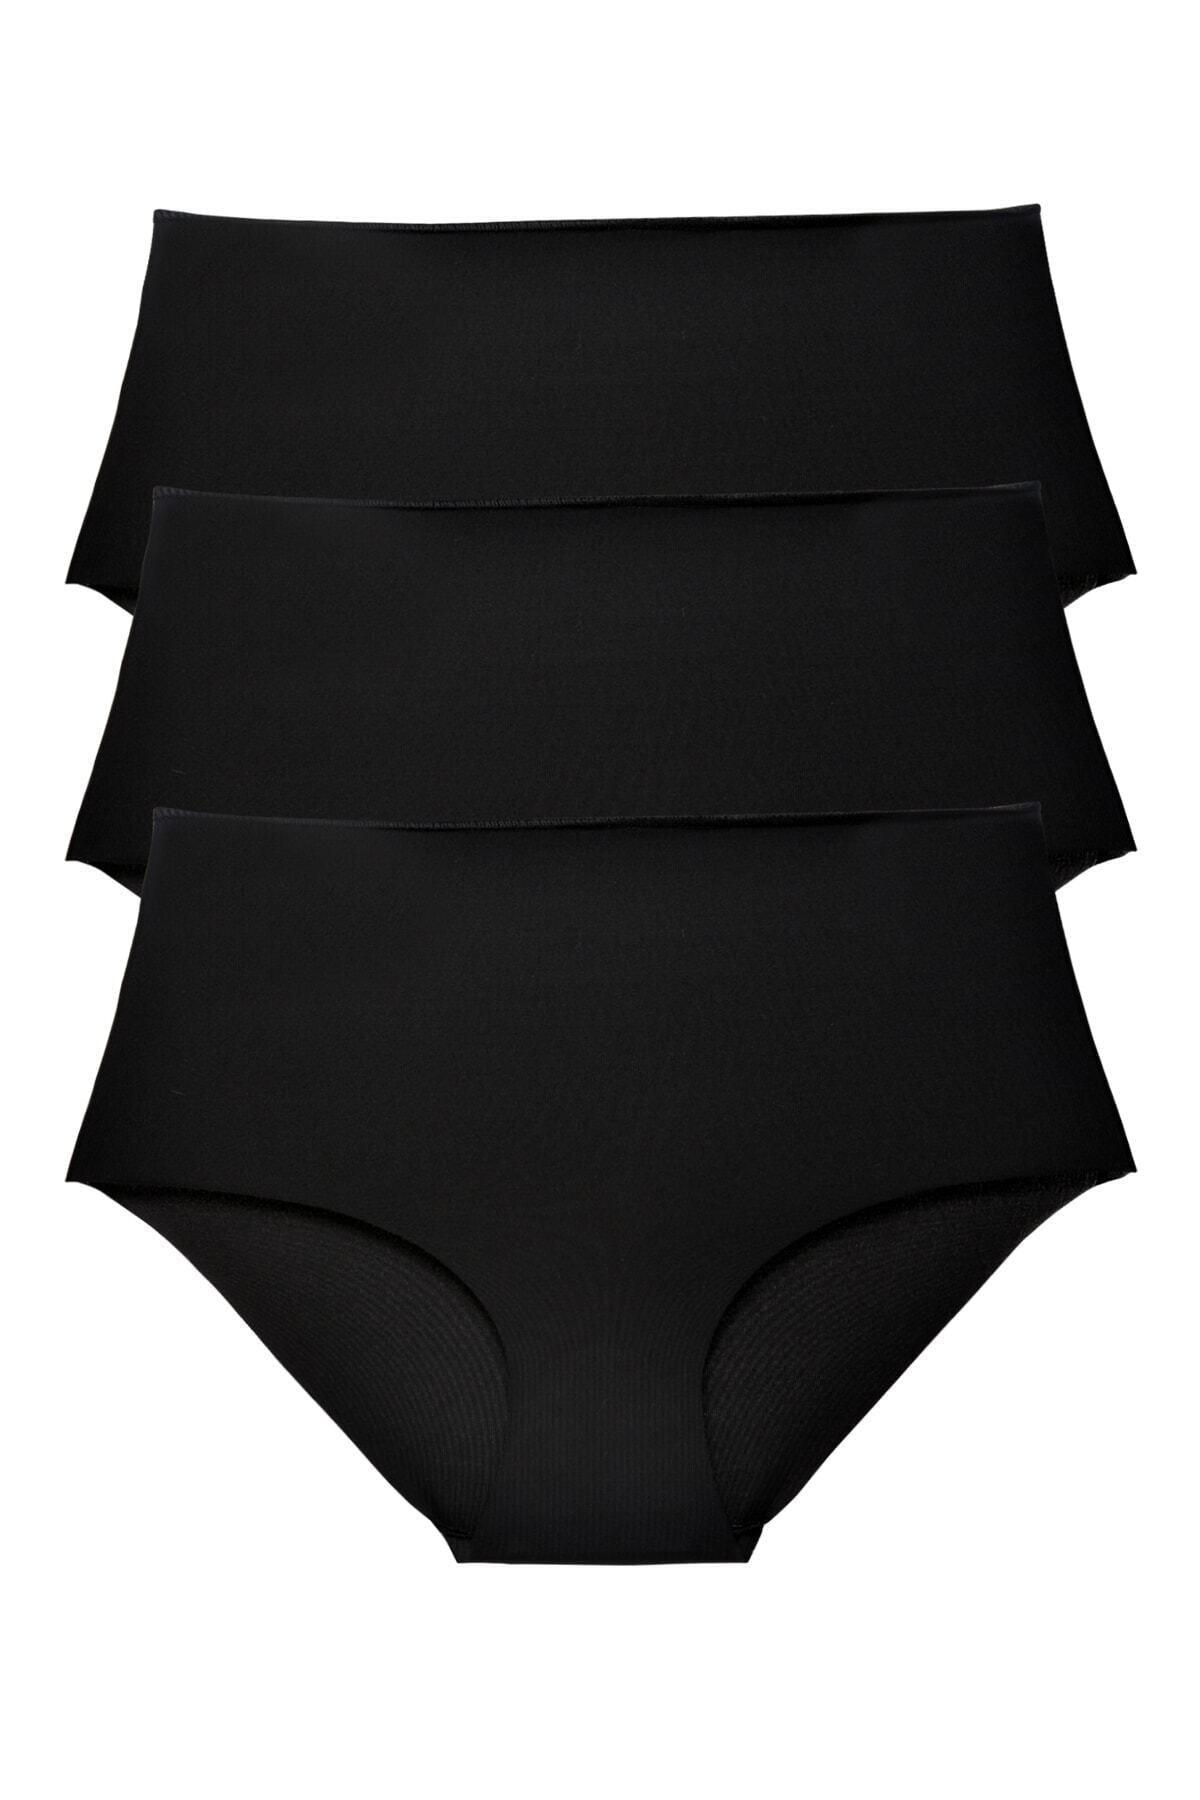 Sensu Kadın Siyah Yüksek Bel Lazer Kesim Külot 3 Lü Paket Set 1